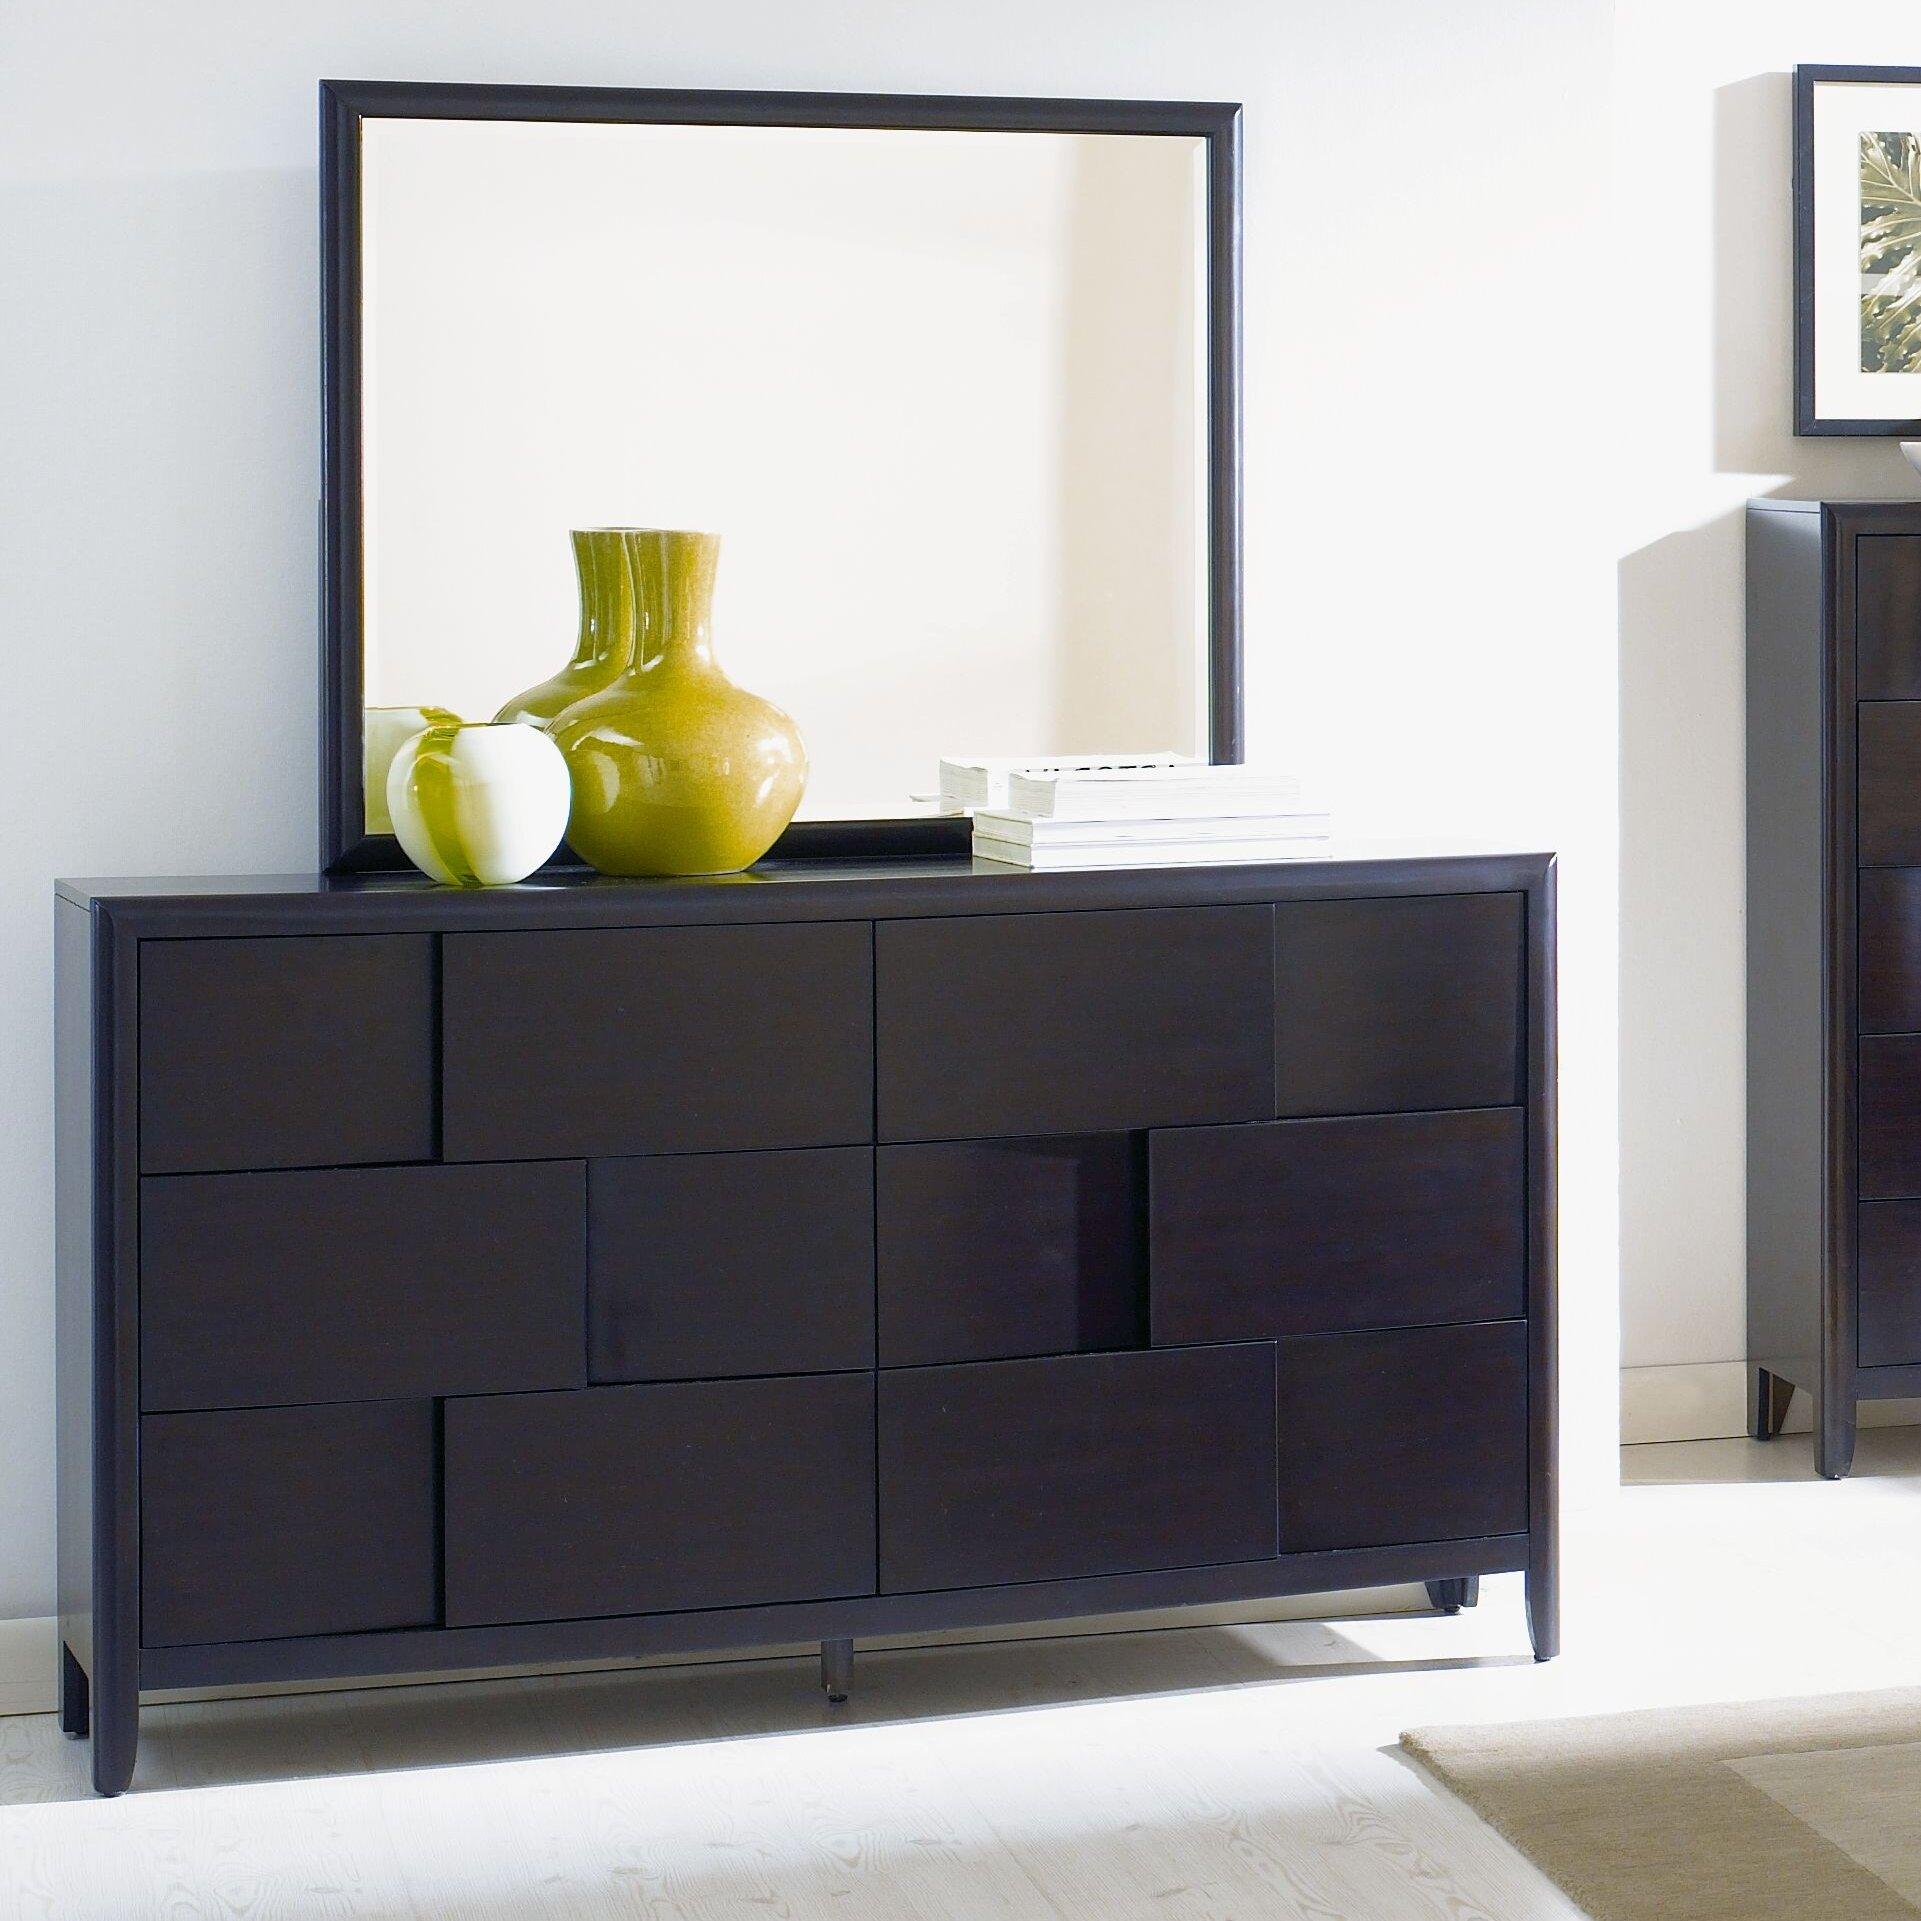 Magnussen Nova 6 Drawer Dresser With Mirror Reviews Wayfair